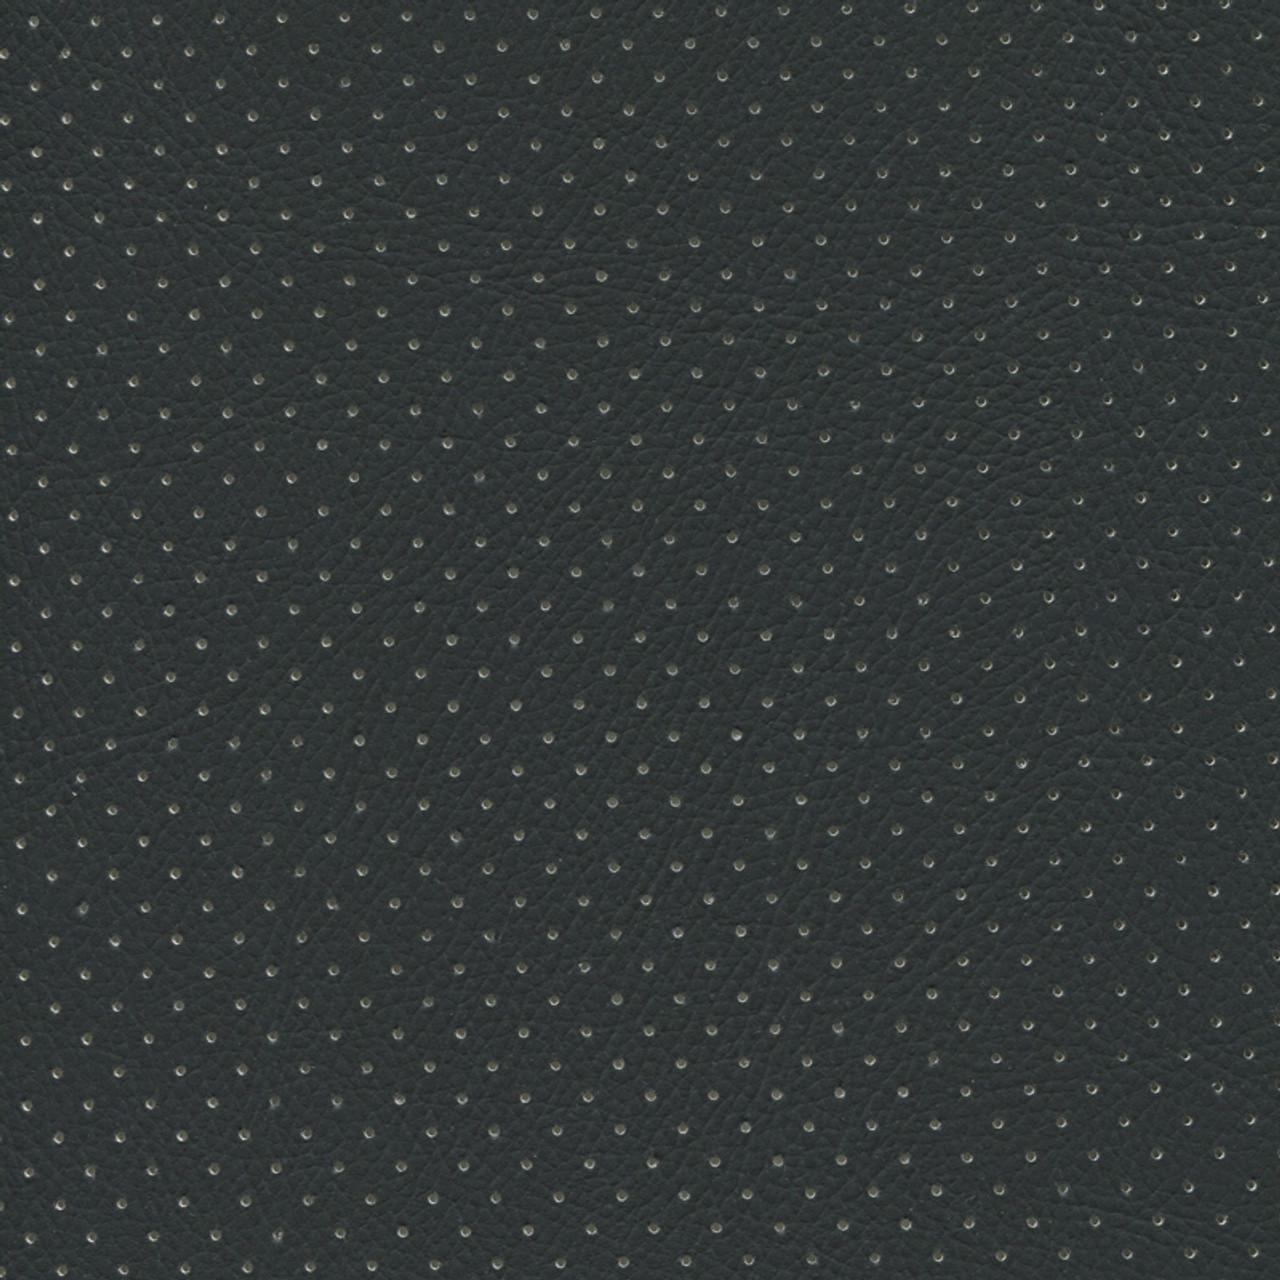 Phantom PHT-503 White/Black Perforated